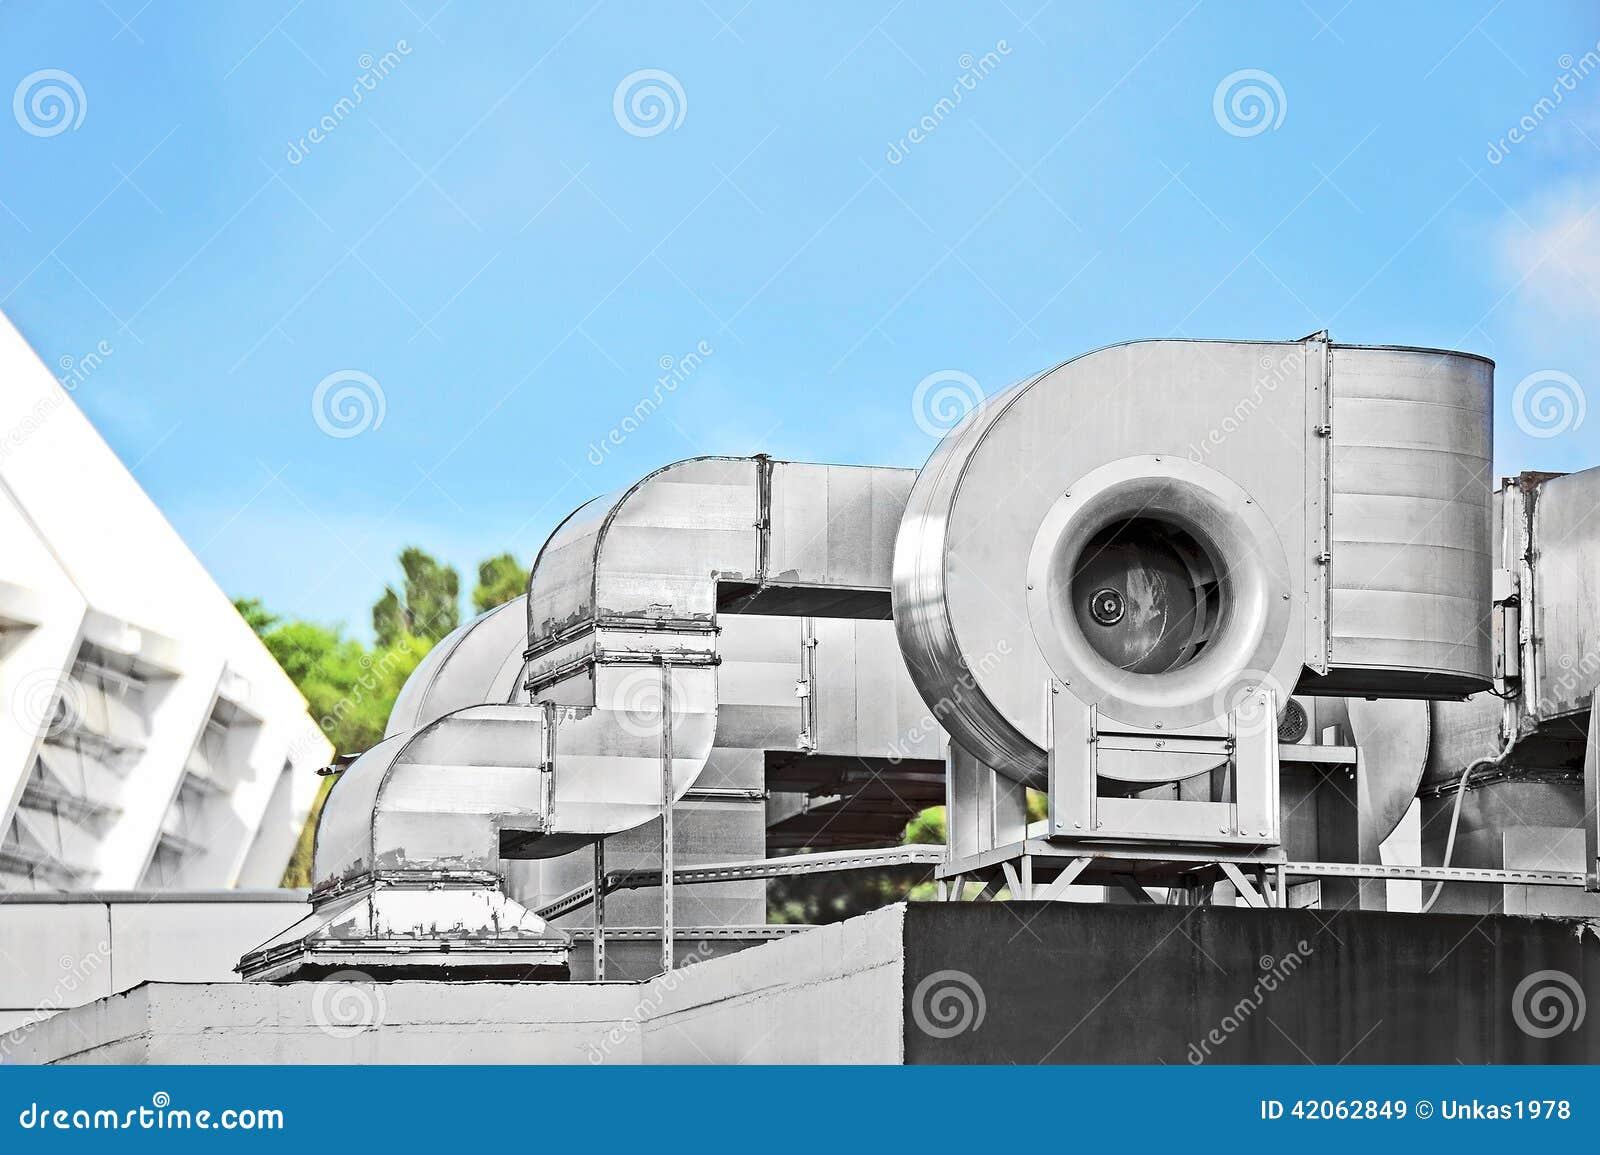 Industrial Air Ventilator : Industrial ventilation system stock image of